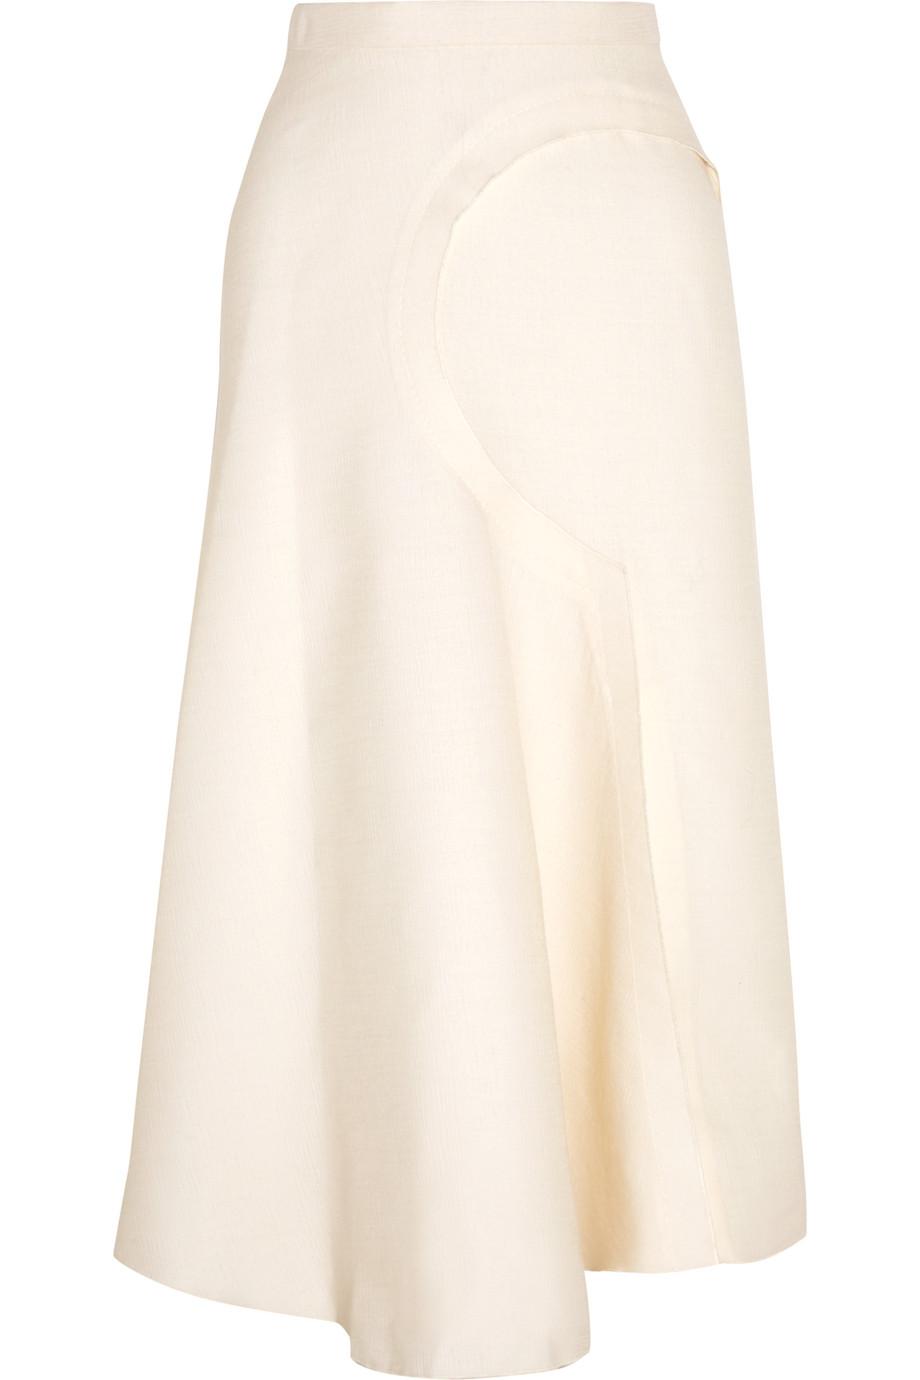 Roksanda Rosalind Slub Wool-Blend Skirt, Ivory, Women's, Size: 8